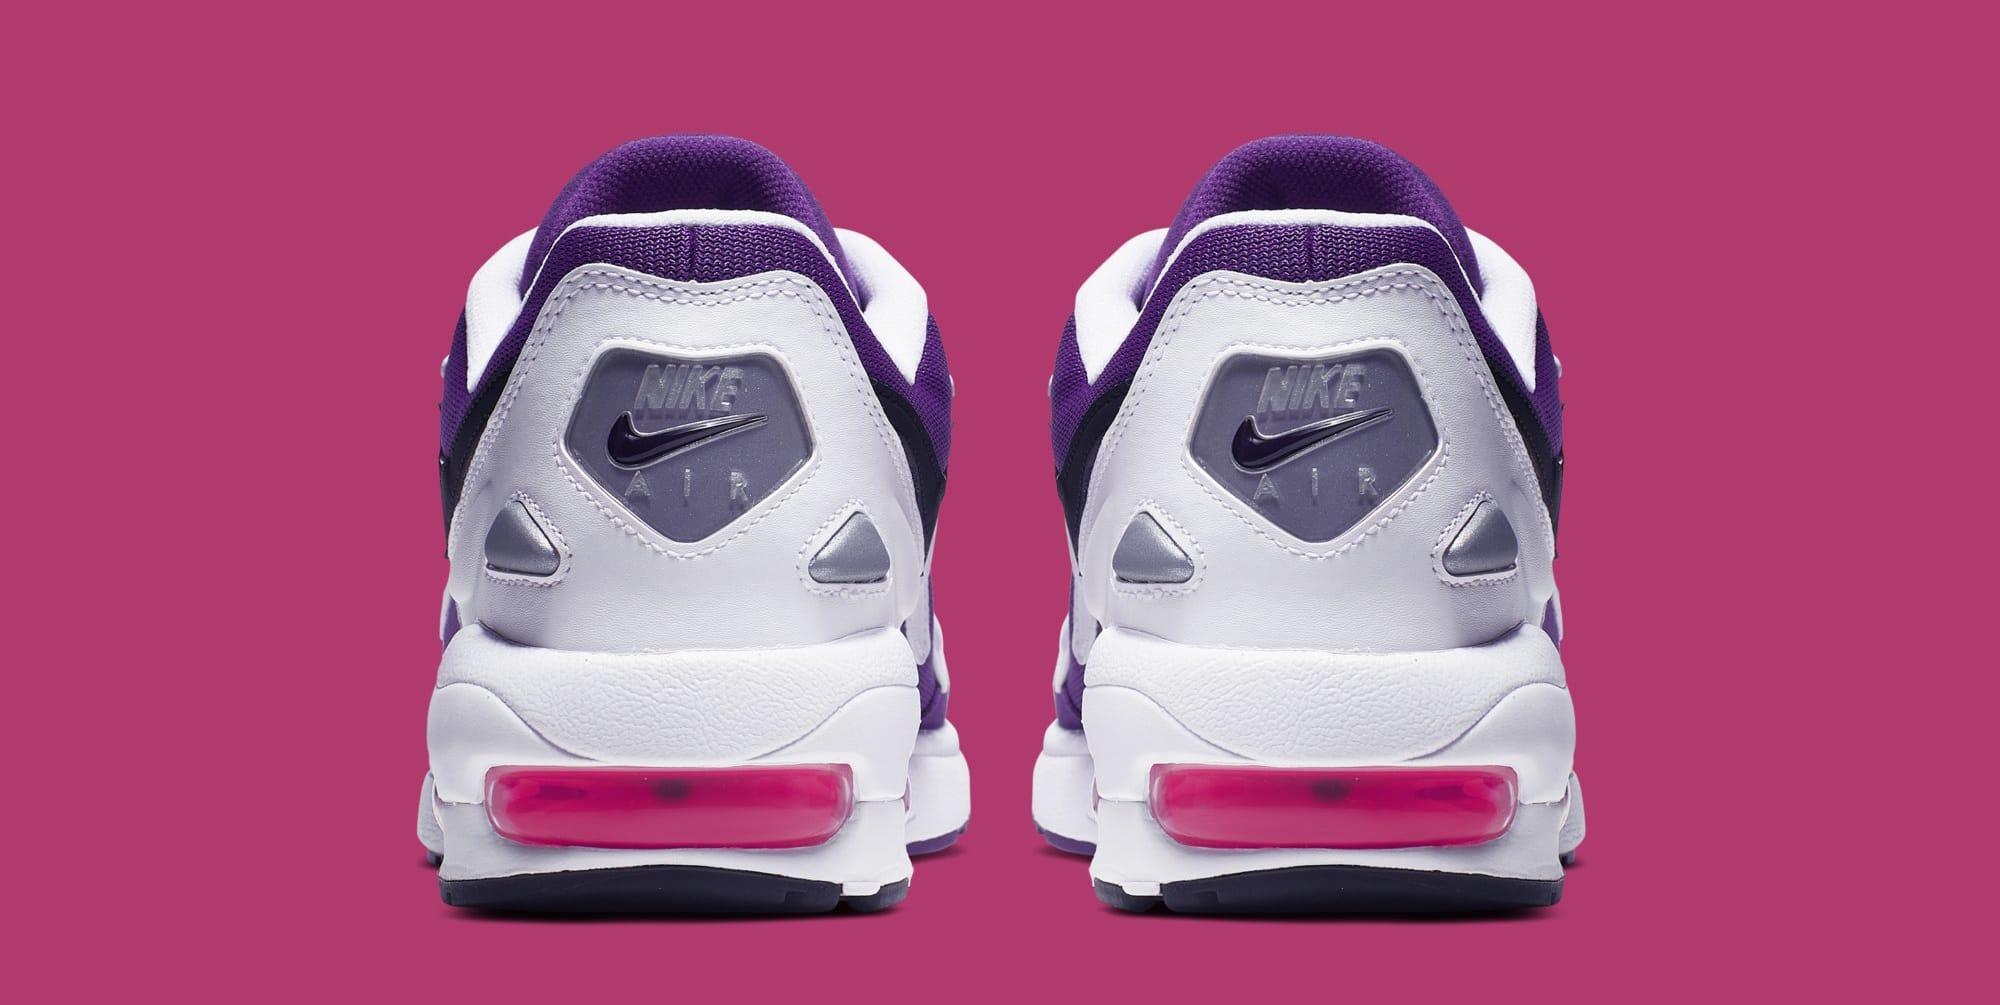 Nike Air Max2 Light 'White/Court Purple-Hyper Pink' AO1741-103 (Heel)